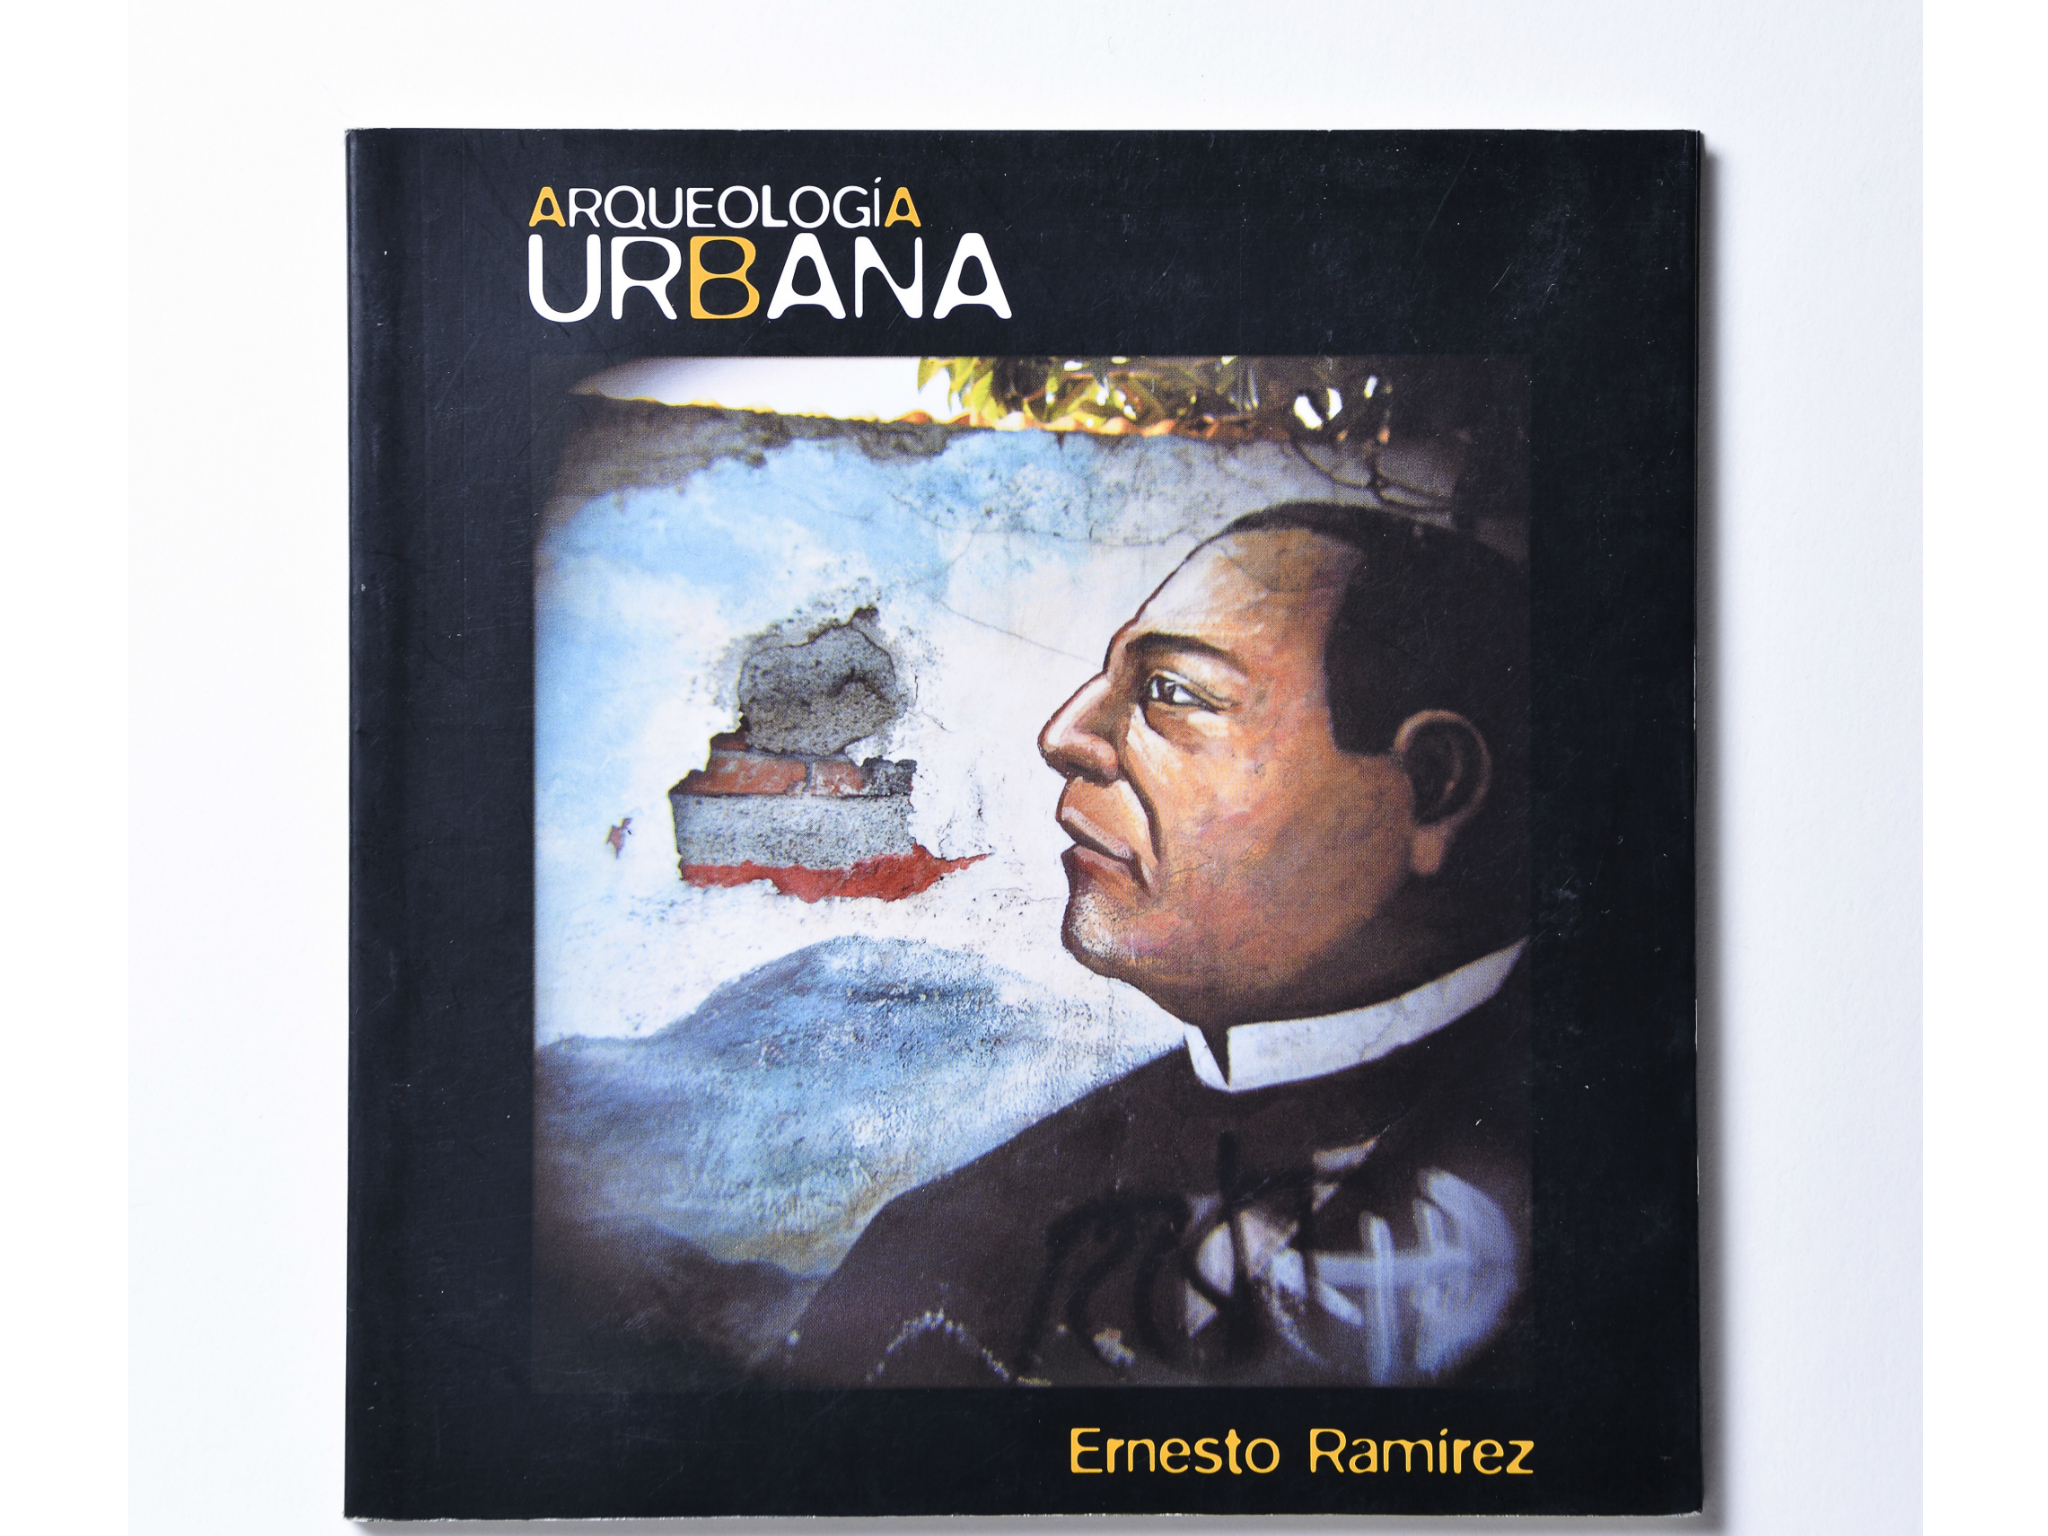 Arqueología Urbana, Ernesto Ramírez